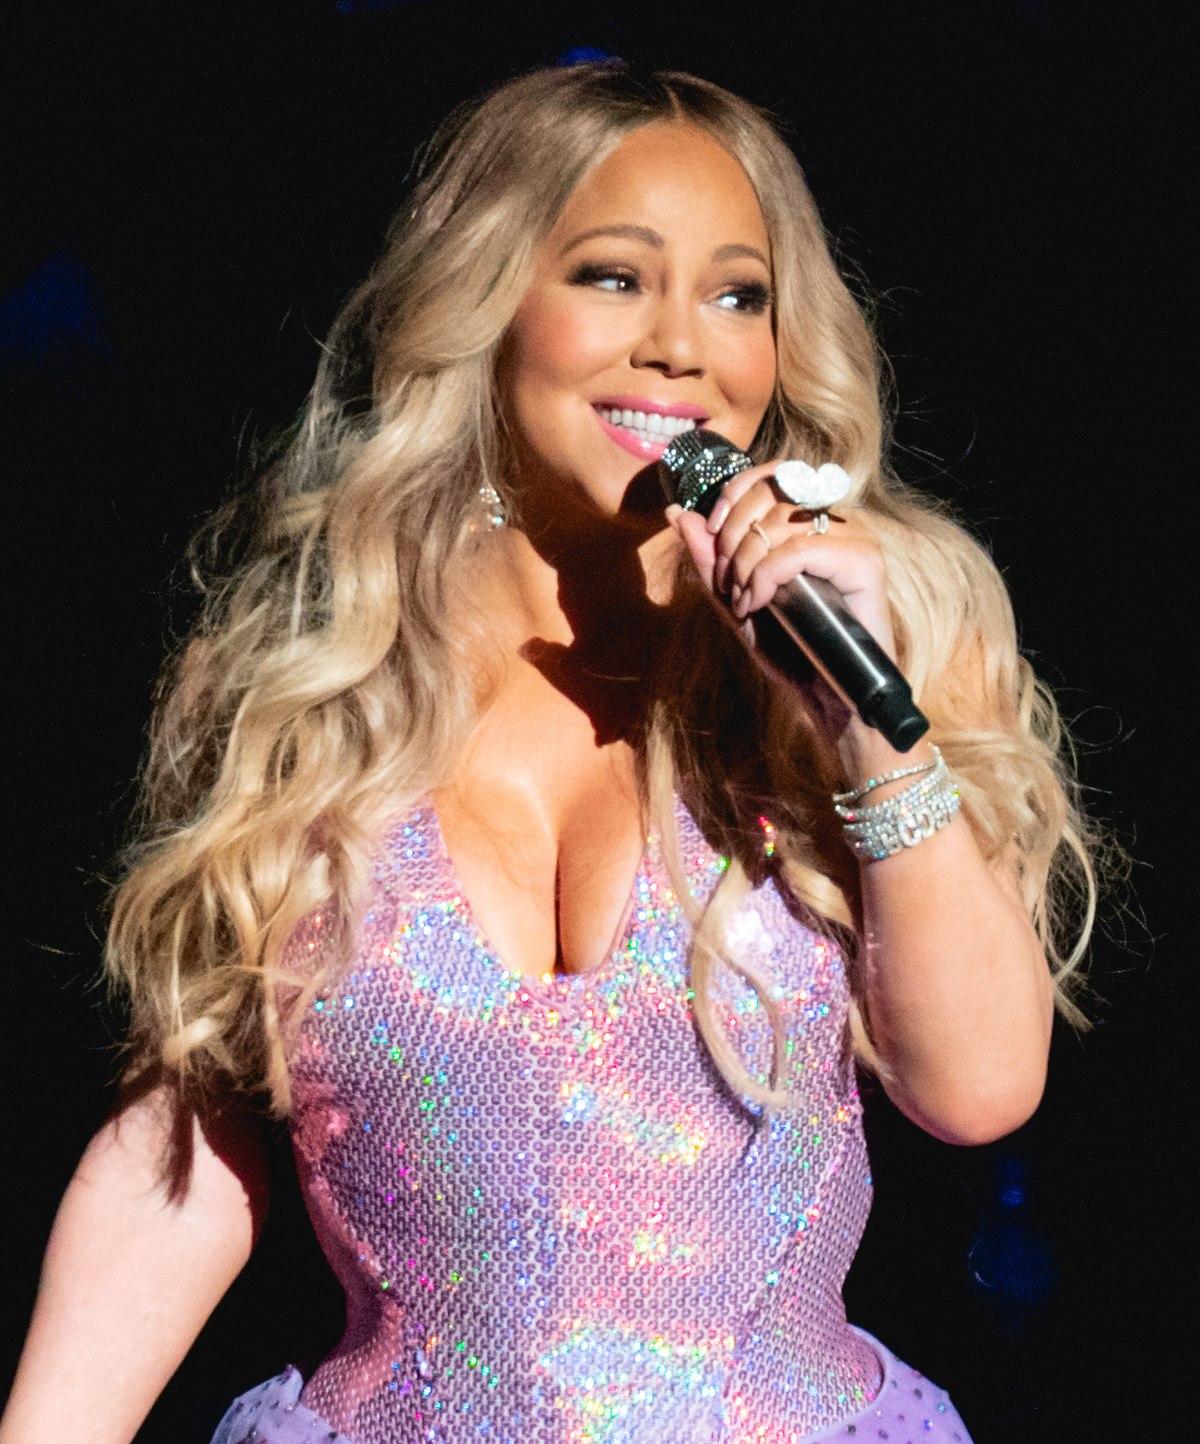 A Brief Biography of Mariah Carey